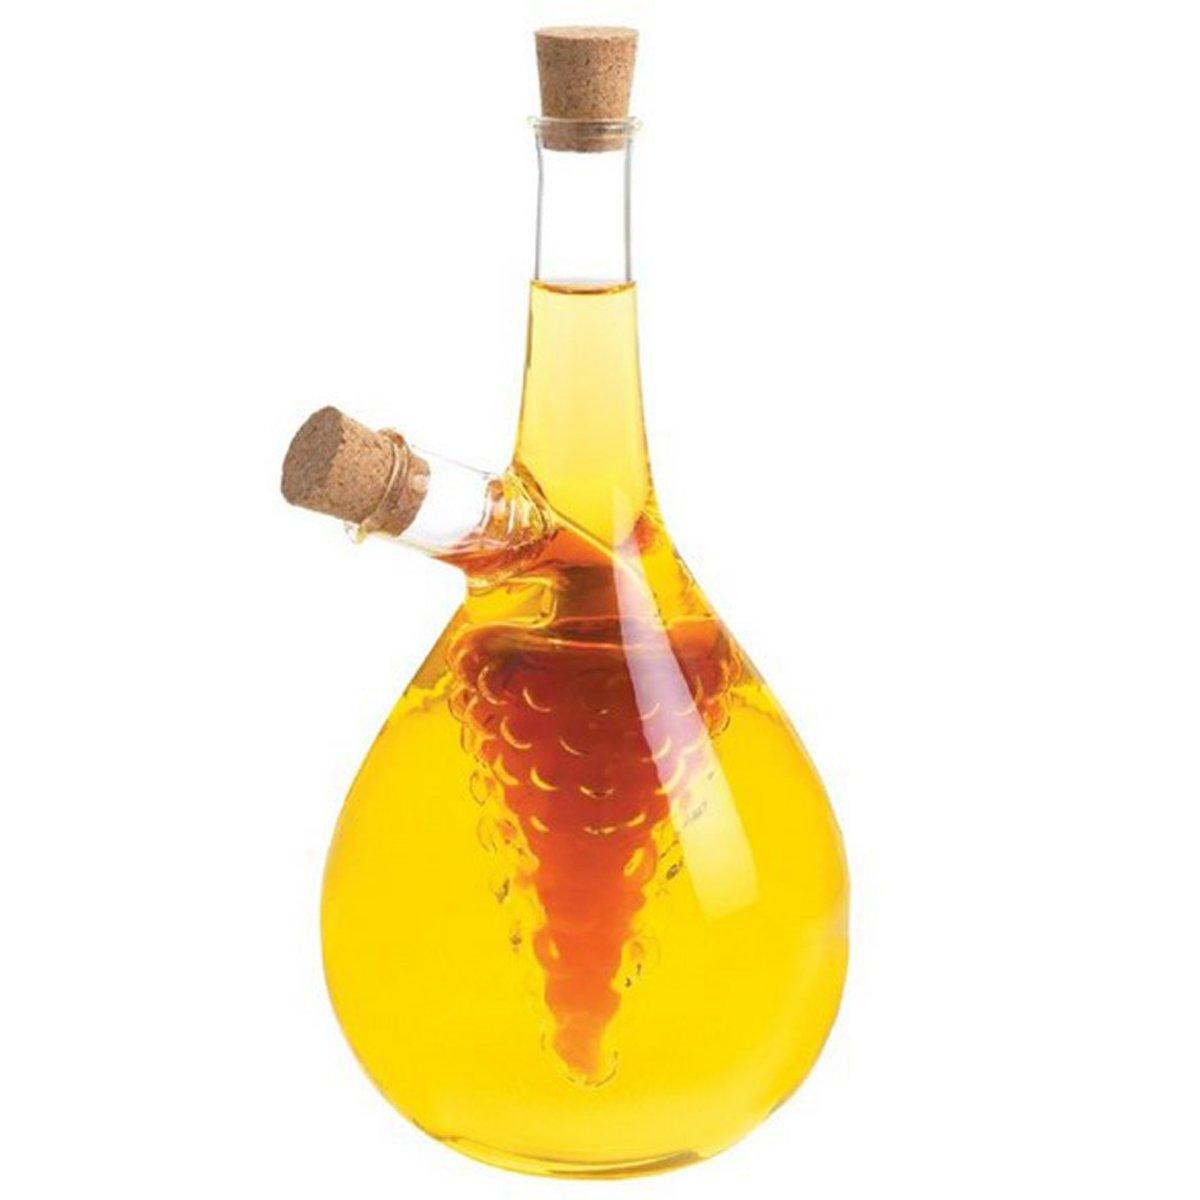 Eleton Kitchen Storage Cooking Tools Oil and Vinegar Bottle, Cruet 8'' With Grape Cluster